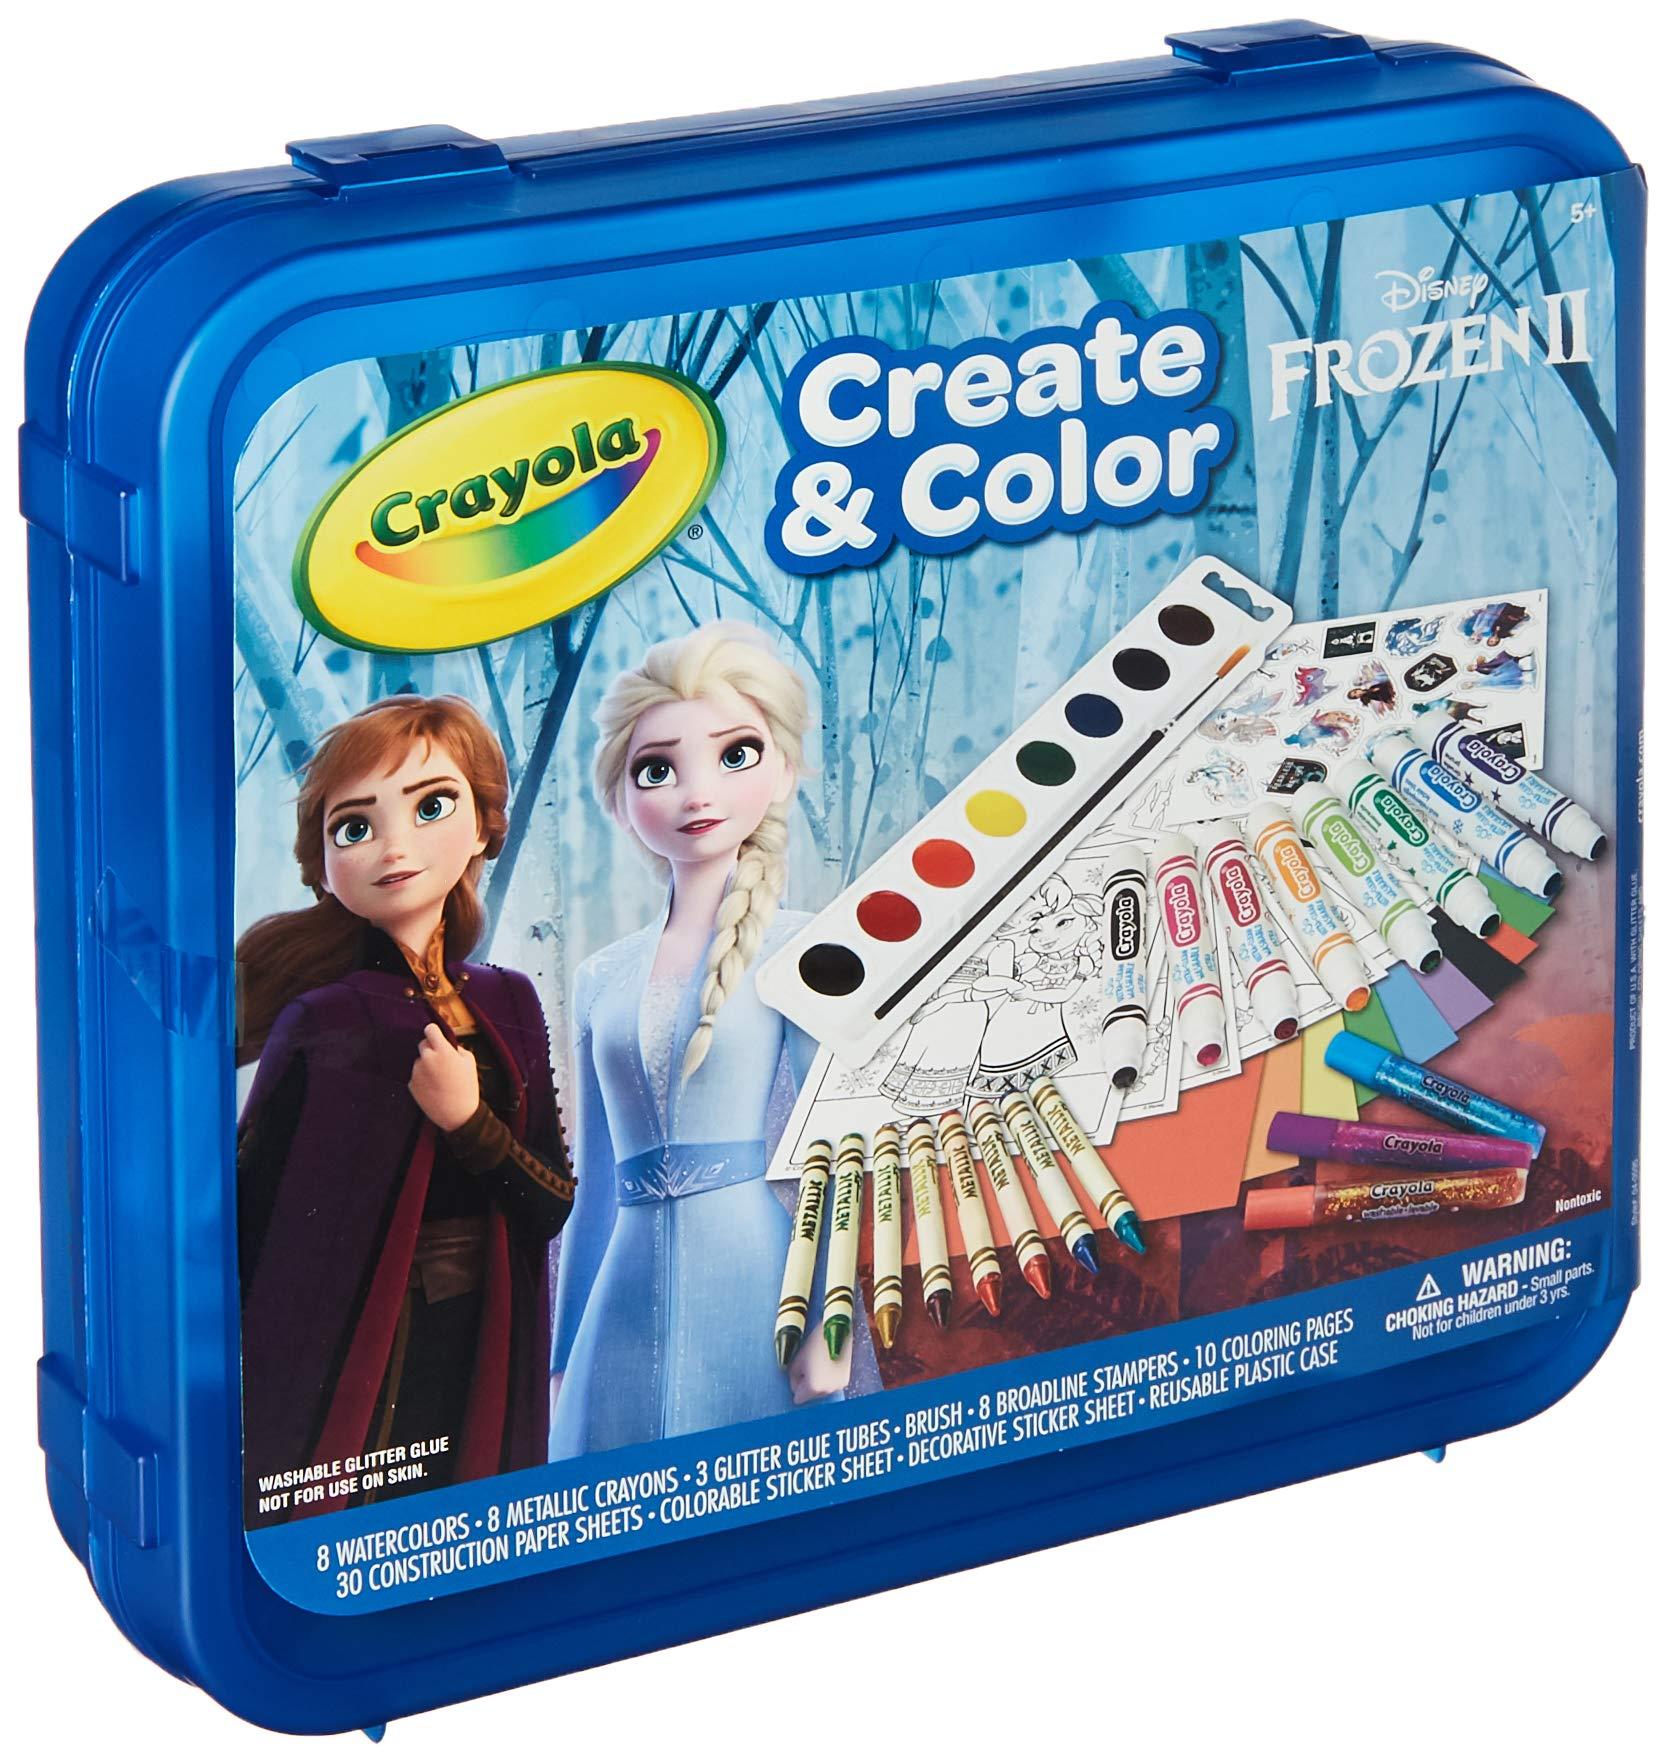 Crayola Frozen 2 Art Set, Arts & Crafts, Gift for Kids, Ages 5, 6, 7, 8